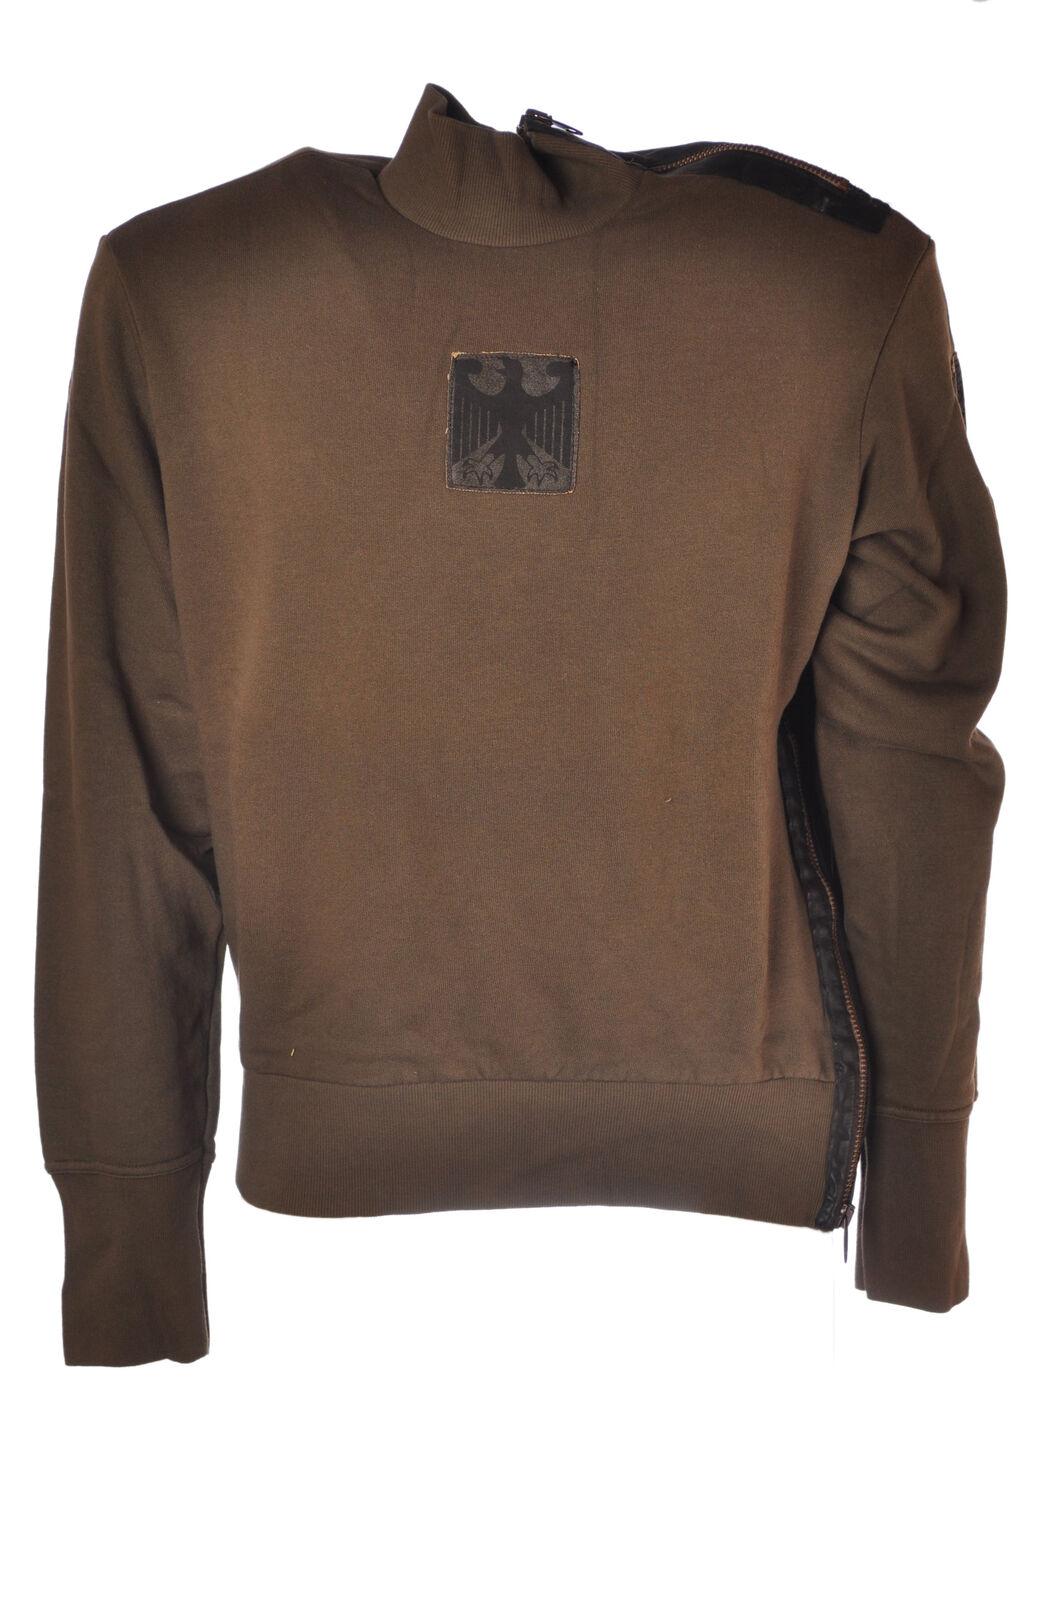 Forniture Civili  -  Sweatshirts - Male - Grün - 4545823A185019